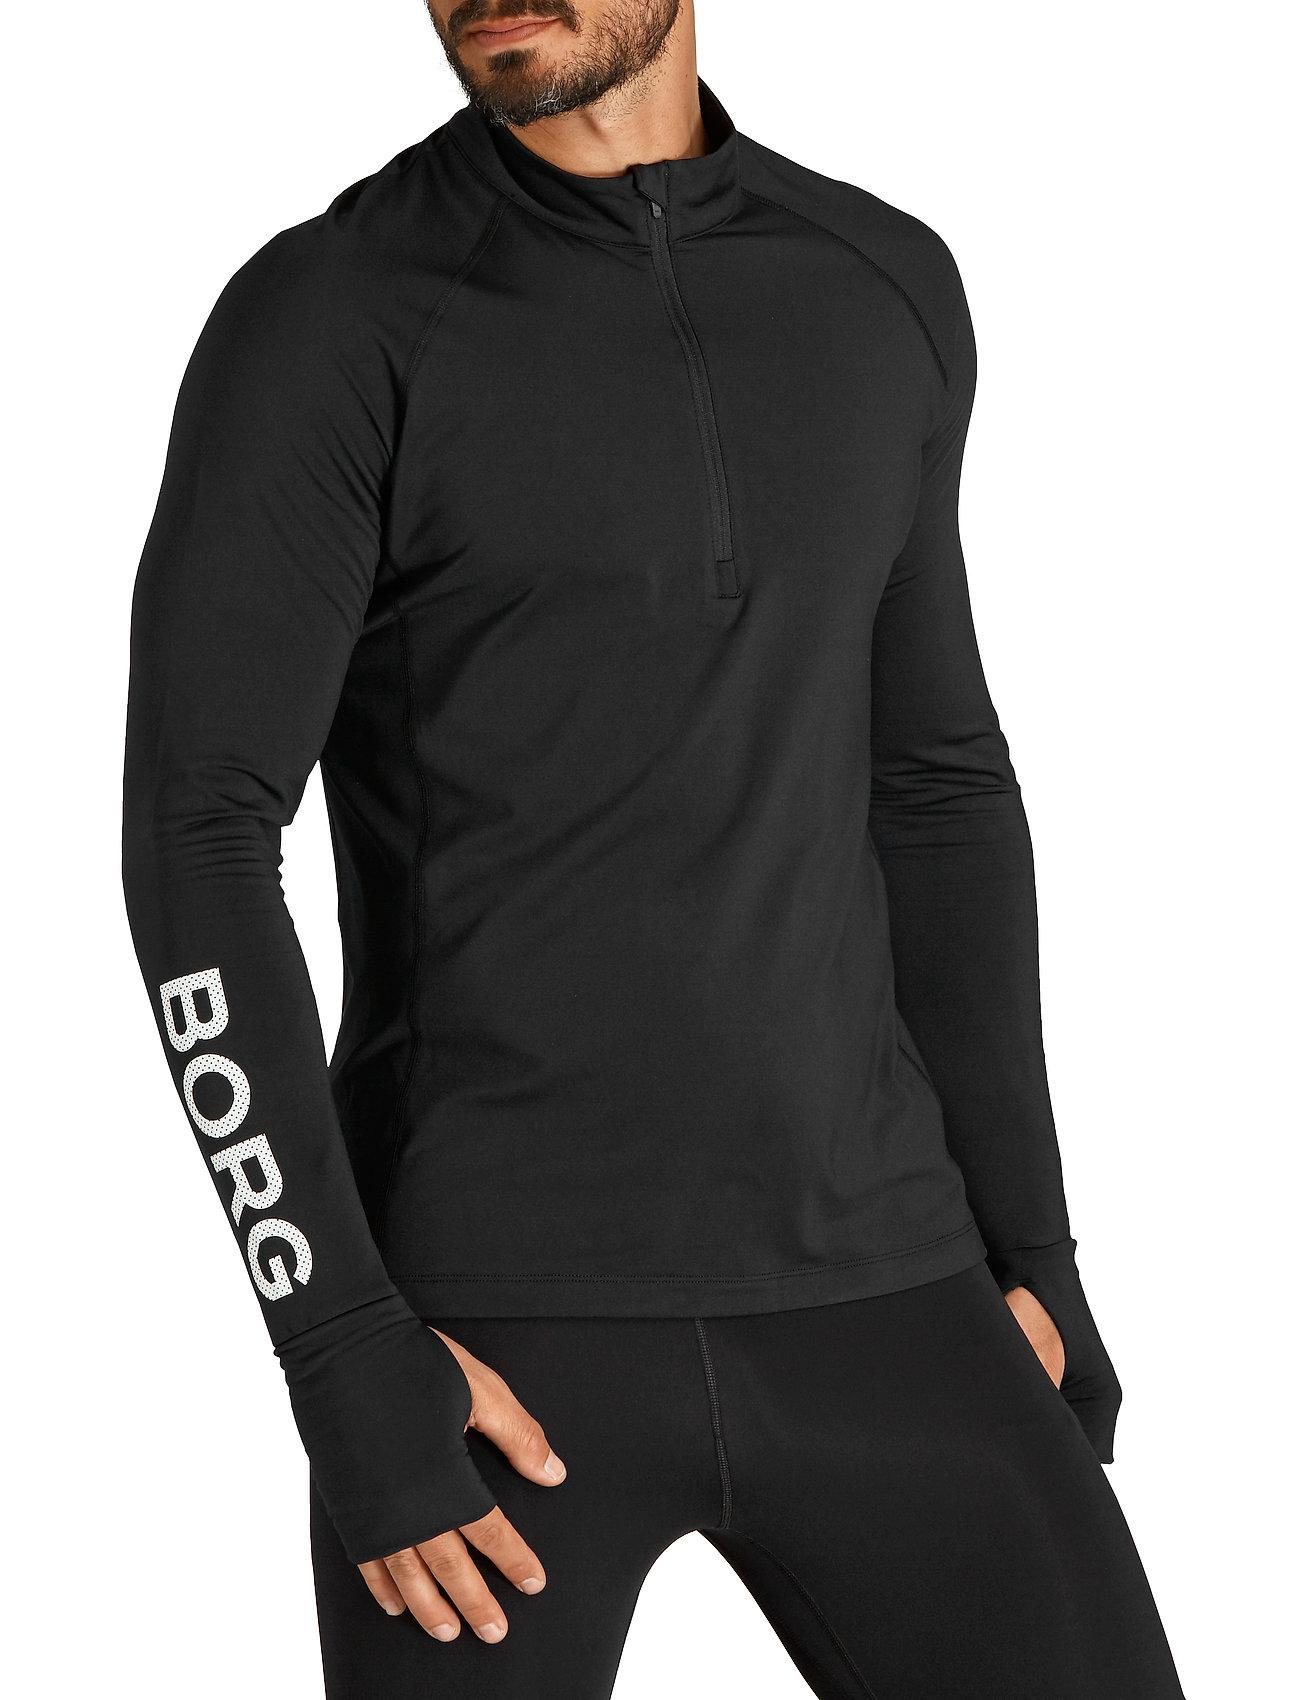 Björn Borg - MIDLAYER HALF ZIP BORG BORG - training jackets - black beauty - 0